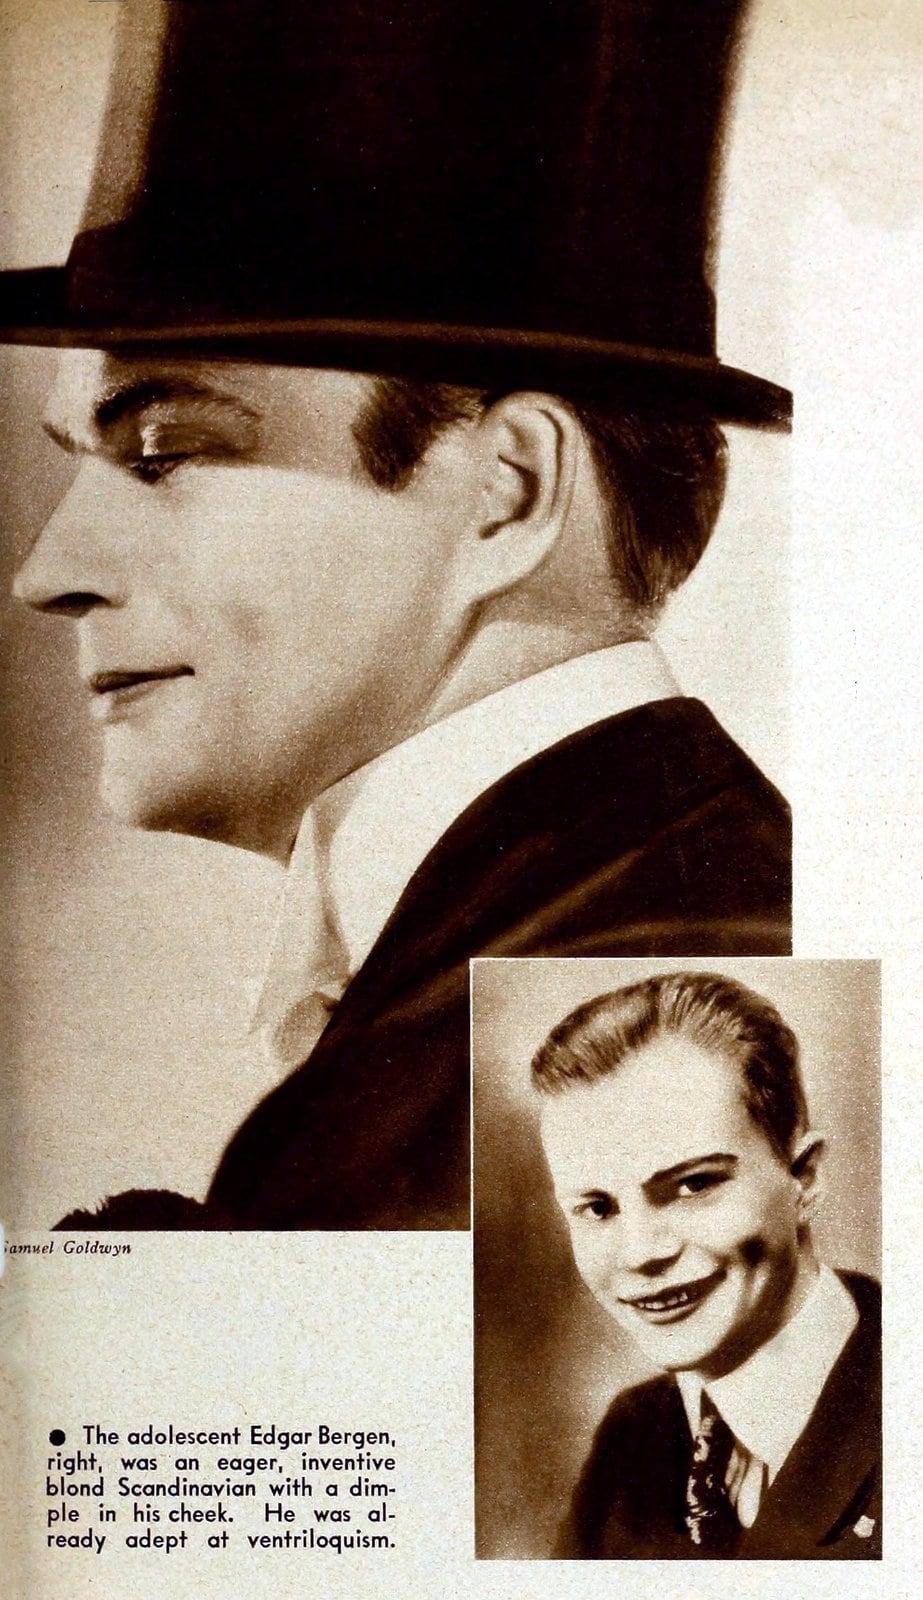 Young Edgar Bergen